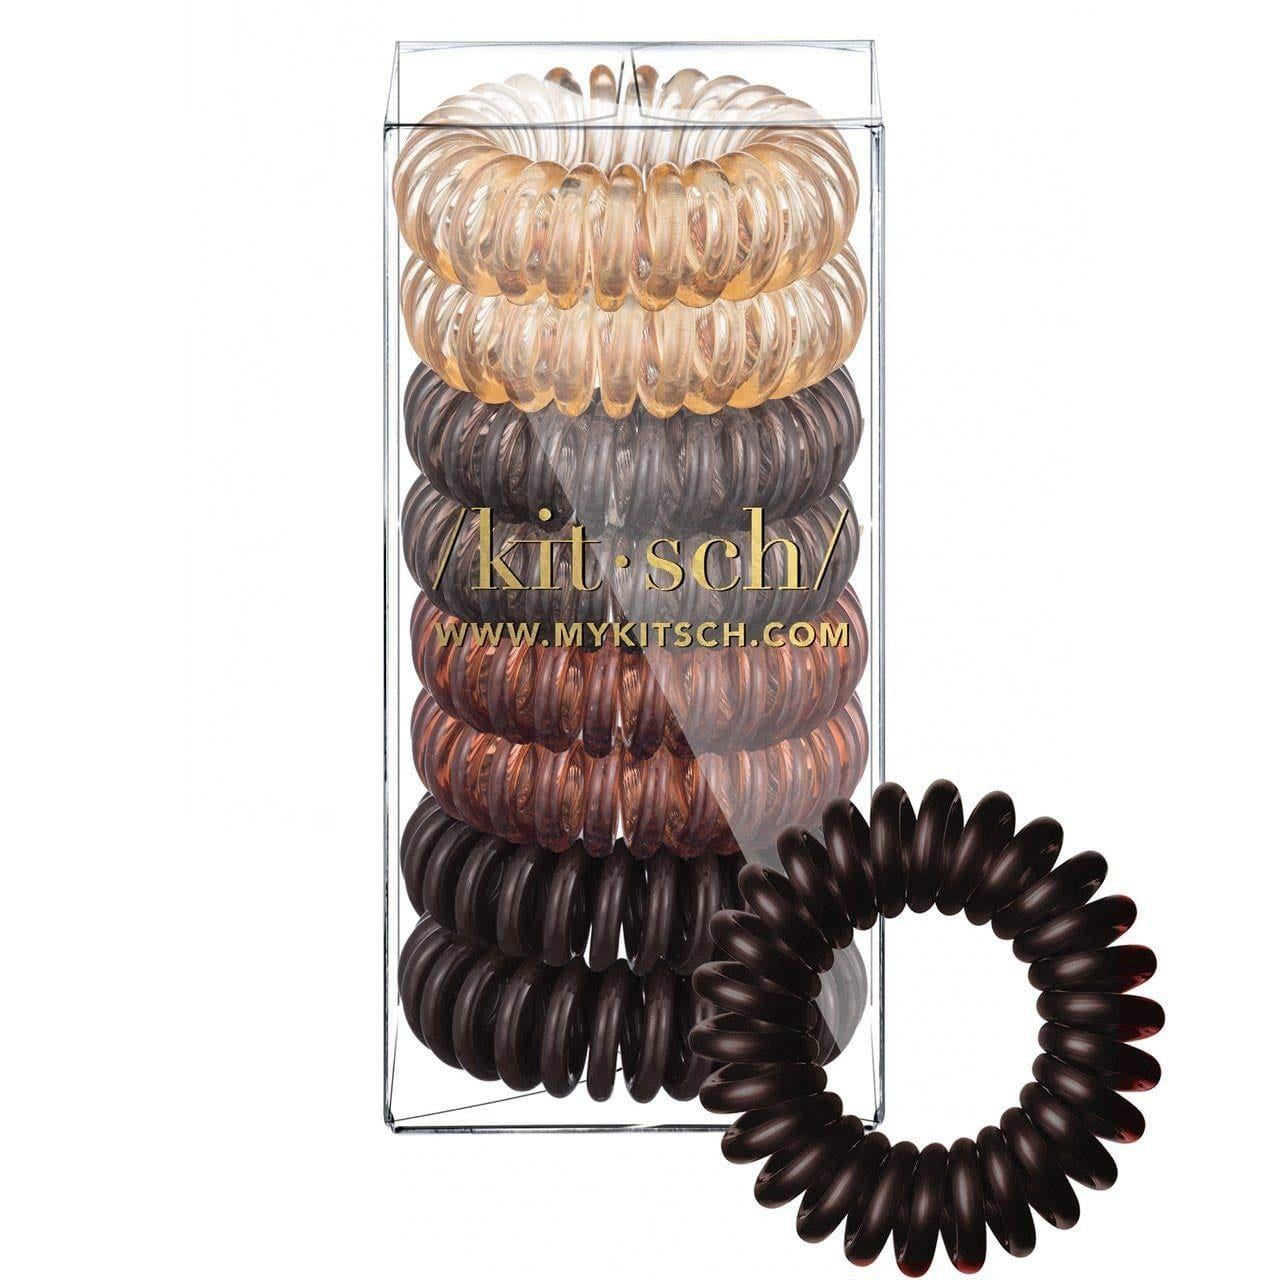 Kitsch Spiral Hair Ties, Coil Hair Ties, Phone Cord Hair Ties, Hair Coils - 8 Pcs, Brunette $6.79